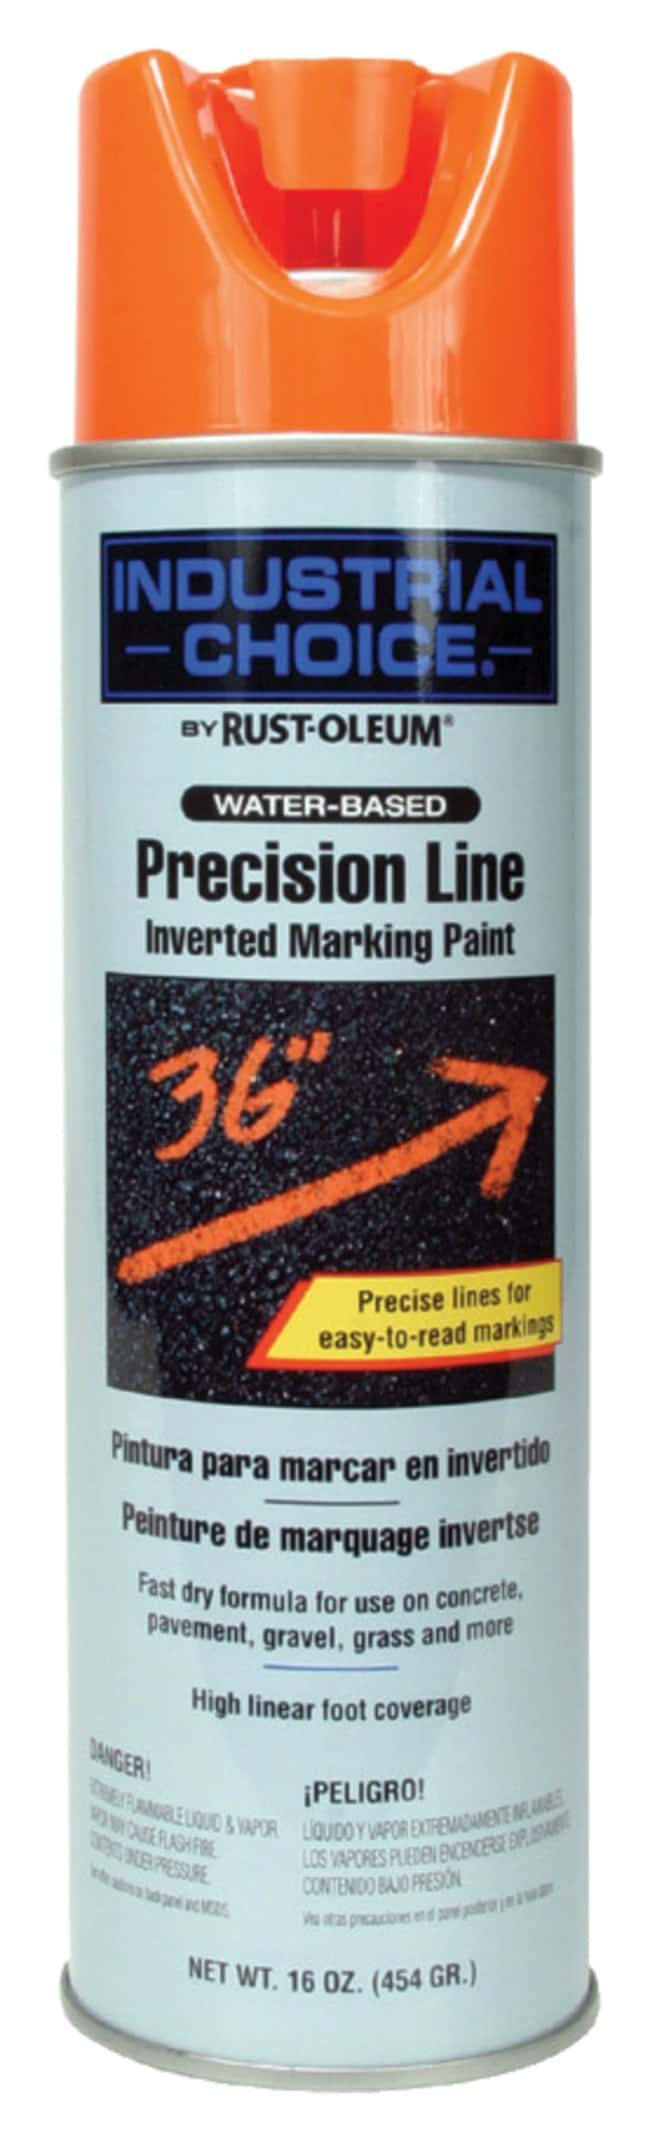 ORS Nasco Rust-Oleum Precision-Line Inverted Marking Paint Color: fluorescent